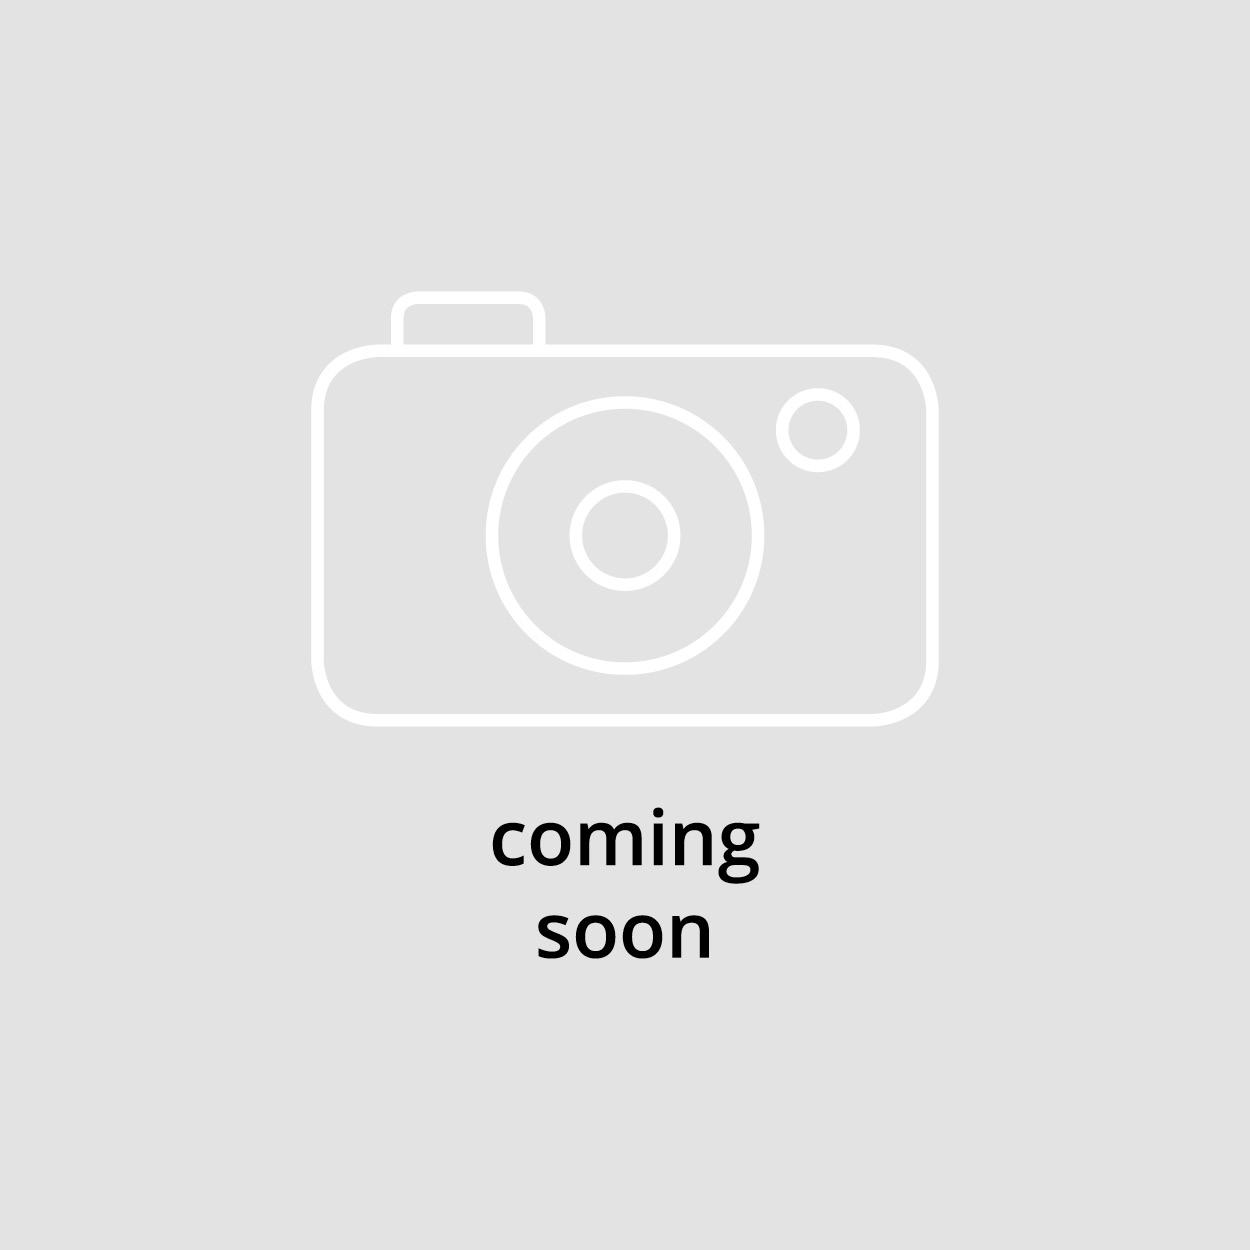 53.01.338 Disco gruppo molle apertura e chiusura pinza per Gildemeister GM16AC